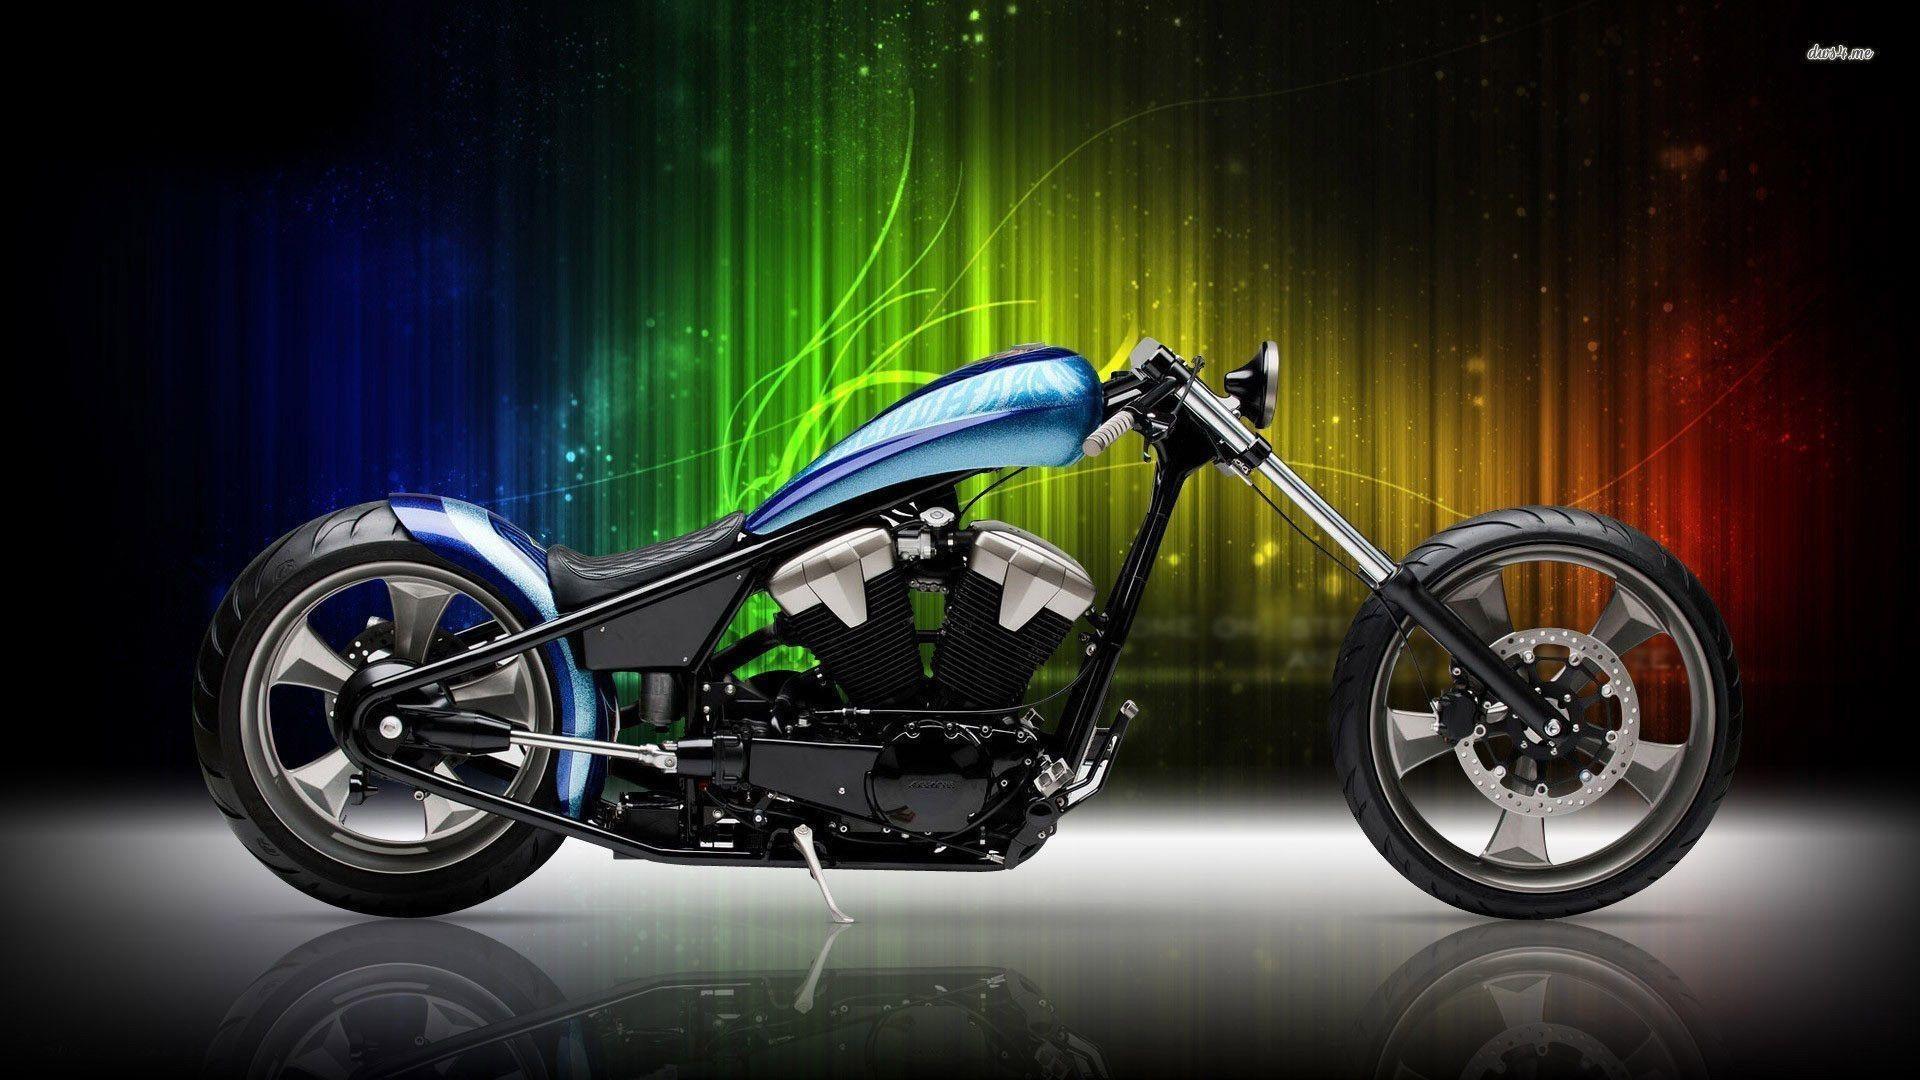 Custom Wallpaper 4k Pubattlegrounds: Motorcycles Wallpaper Desktop (52+ Images